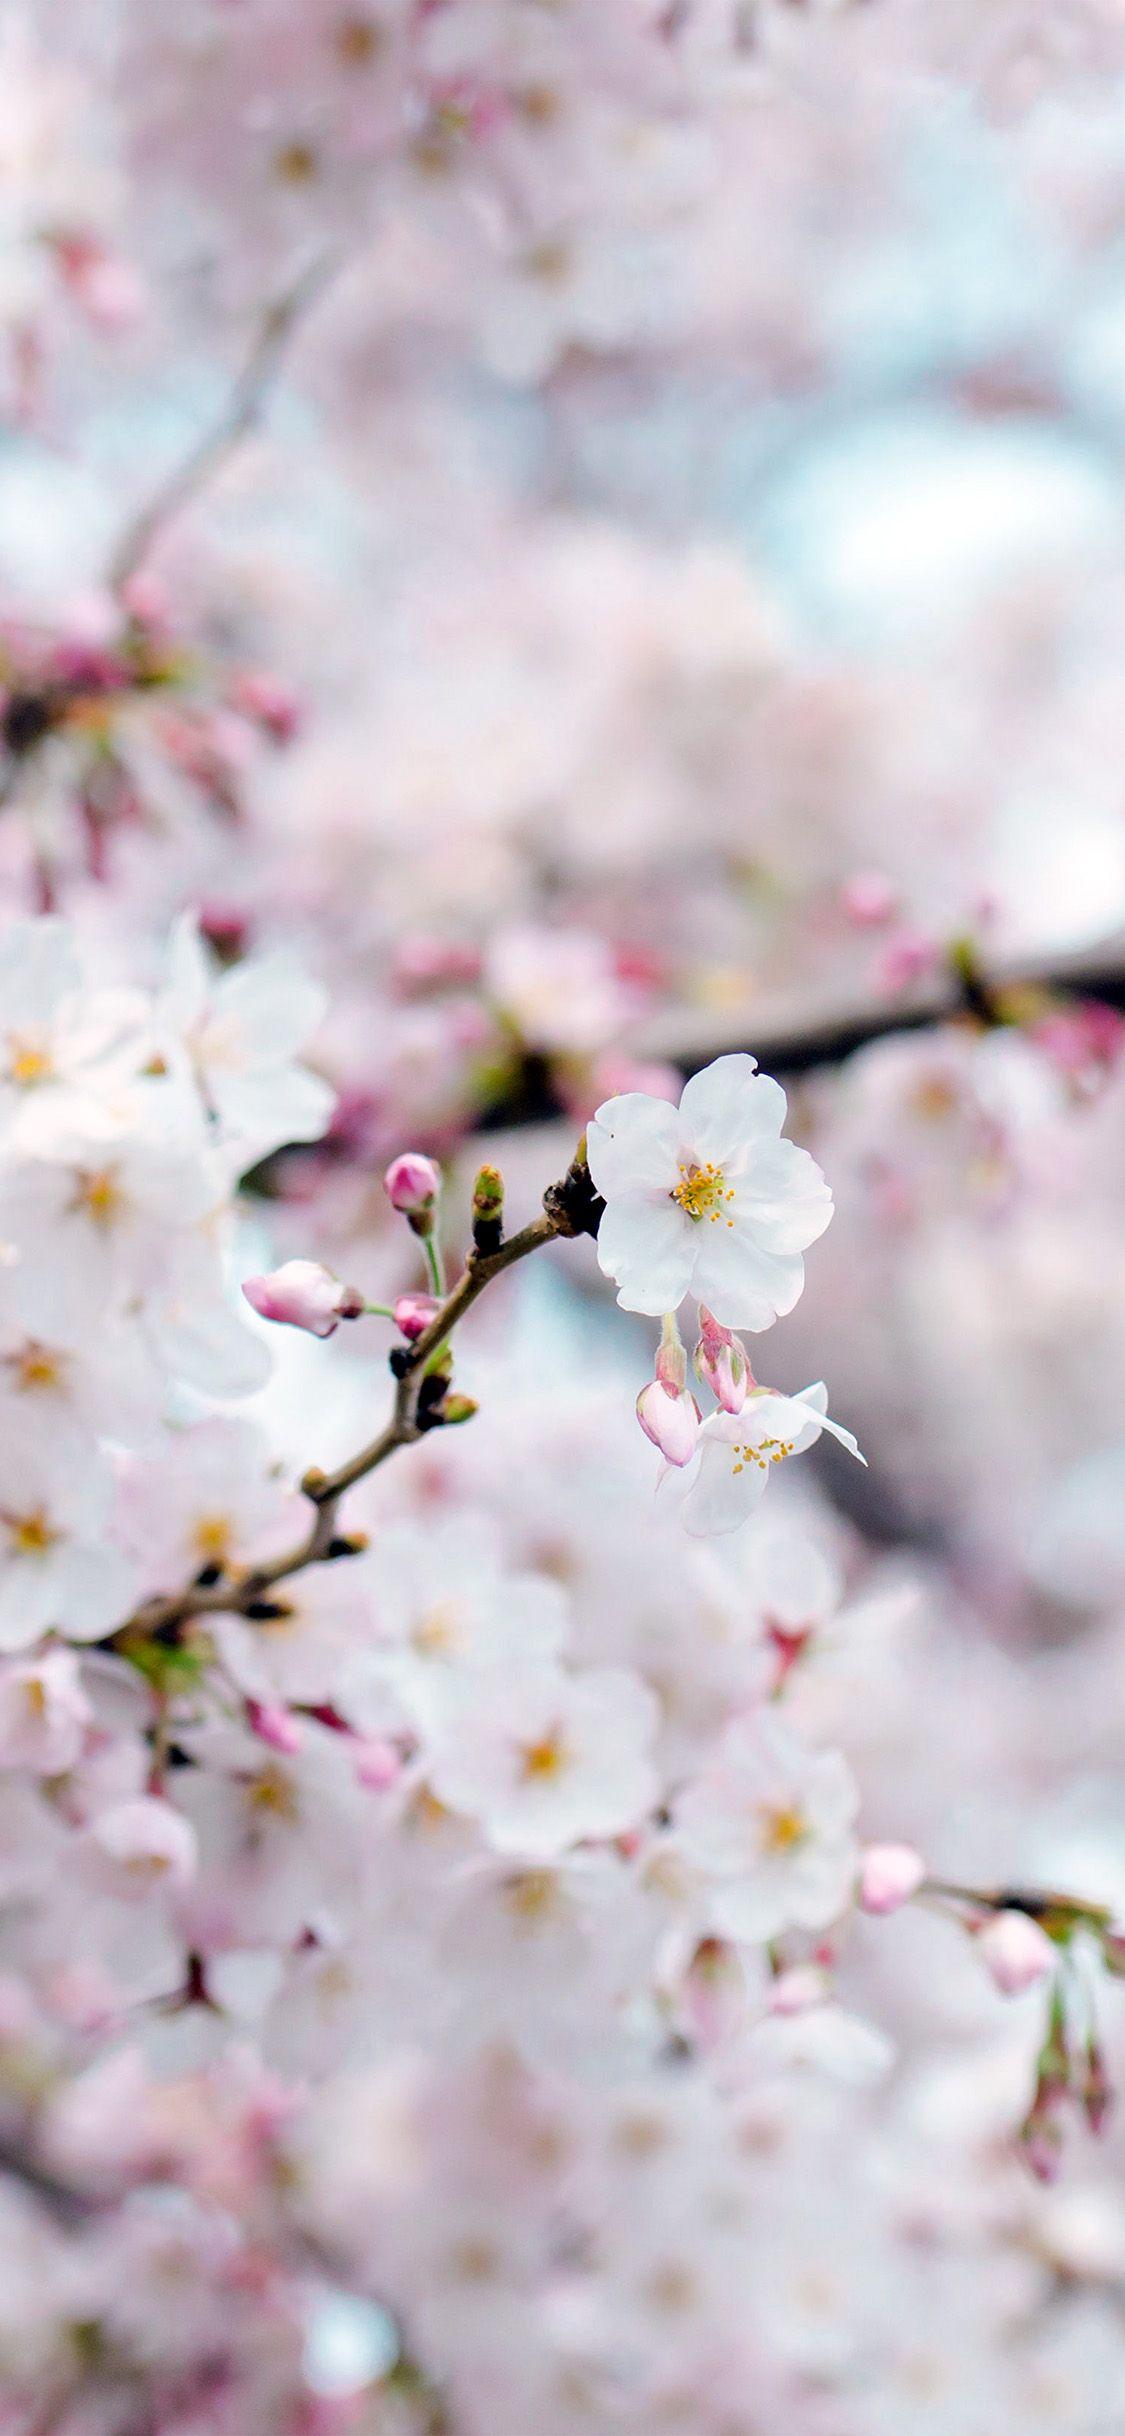 Iphonex Wallpaper Nx70 Cherry Blossom Flower Spring Tree Bokeh Nature Spring Wallpaper Flower Background Iphone Wallpaper Iphone Cute